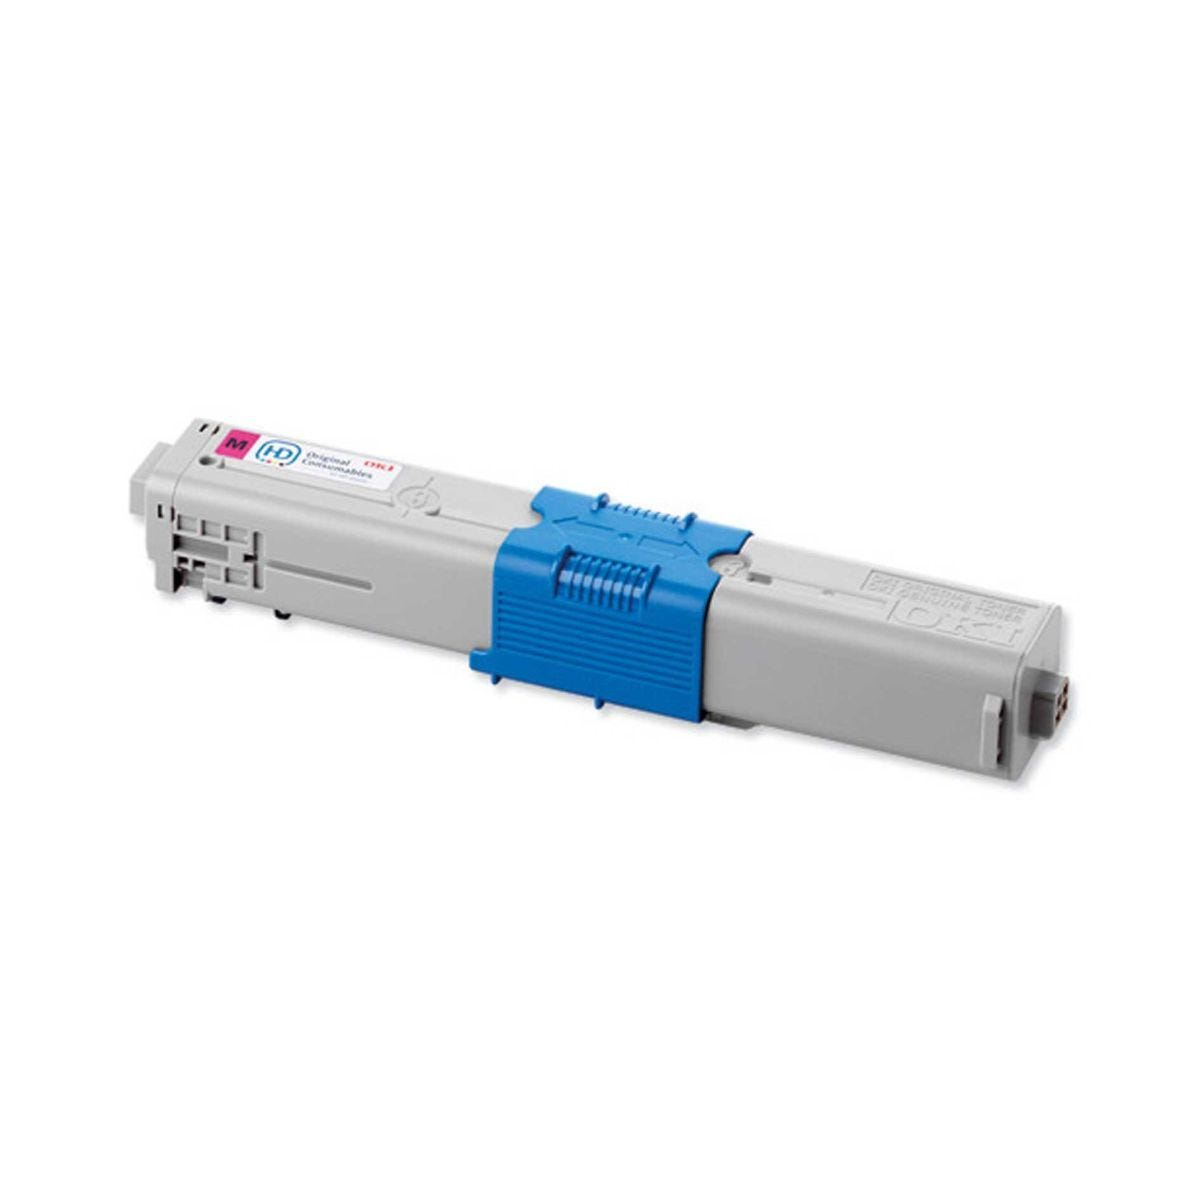 Oki C561 High Capacity Printer Ink Toner Cartridge